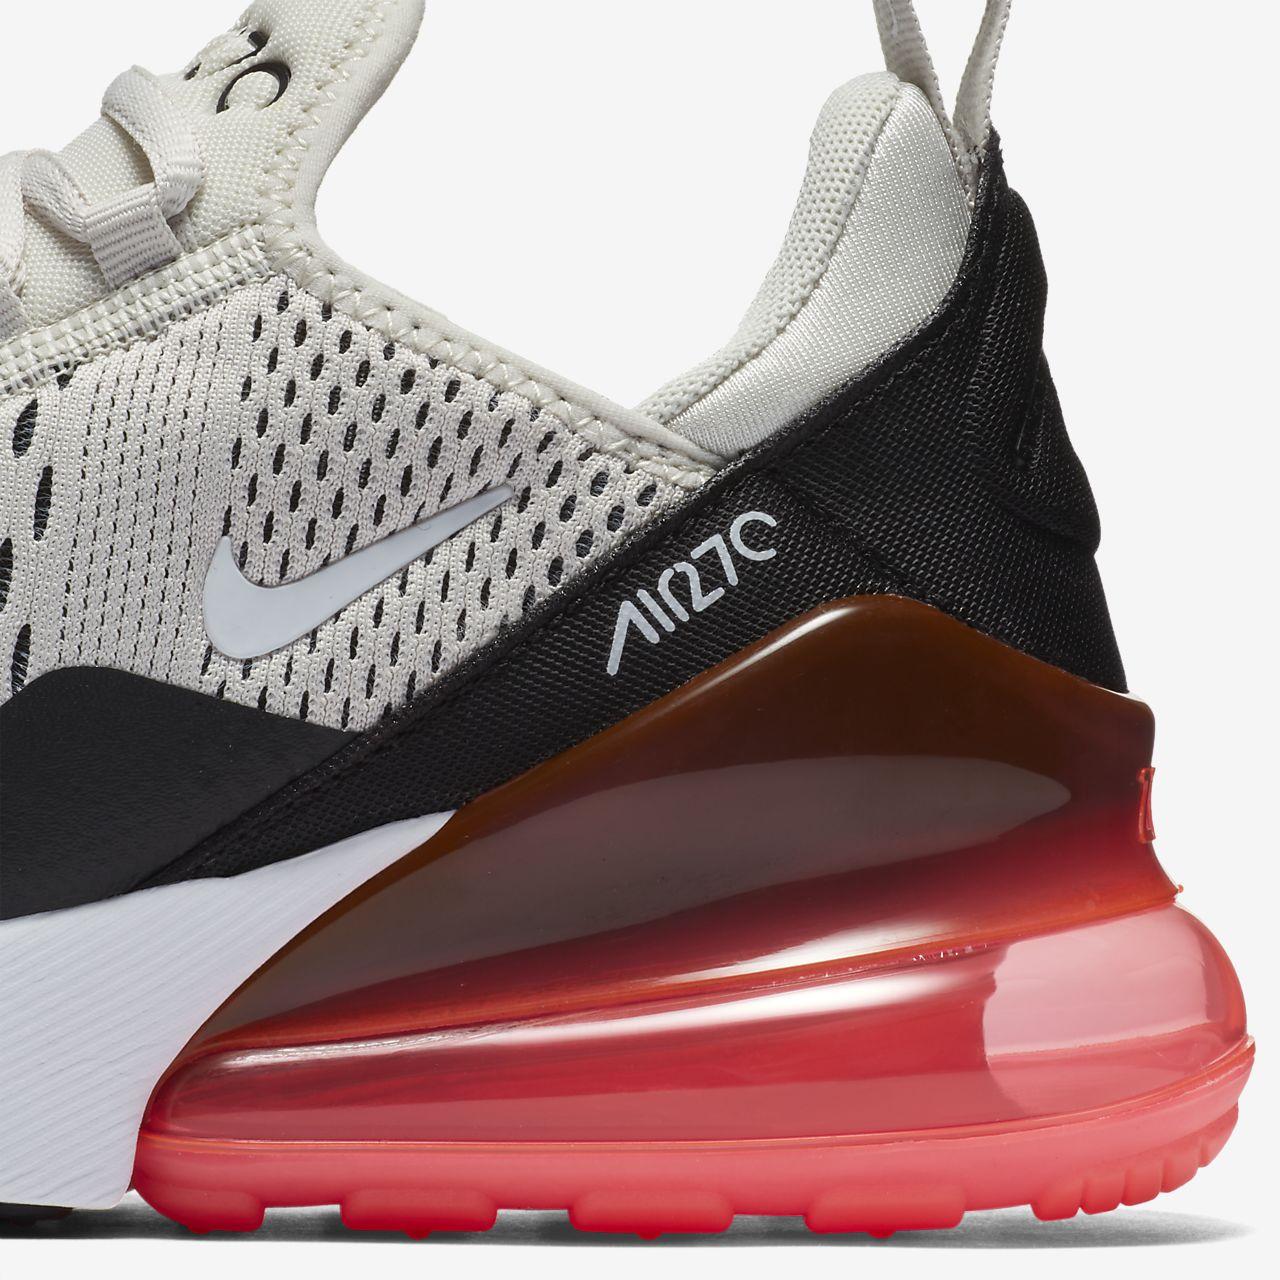 official photos 96ce6 4c8ba Nike Air Max 270 Big Kids' Shoe